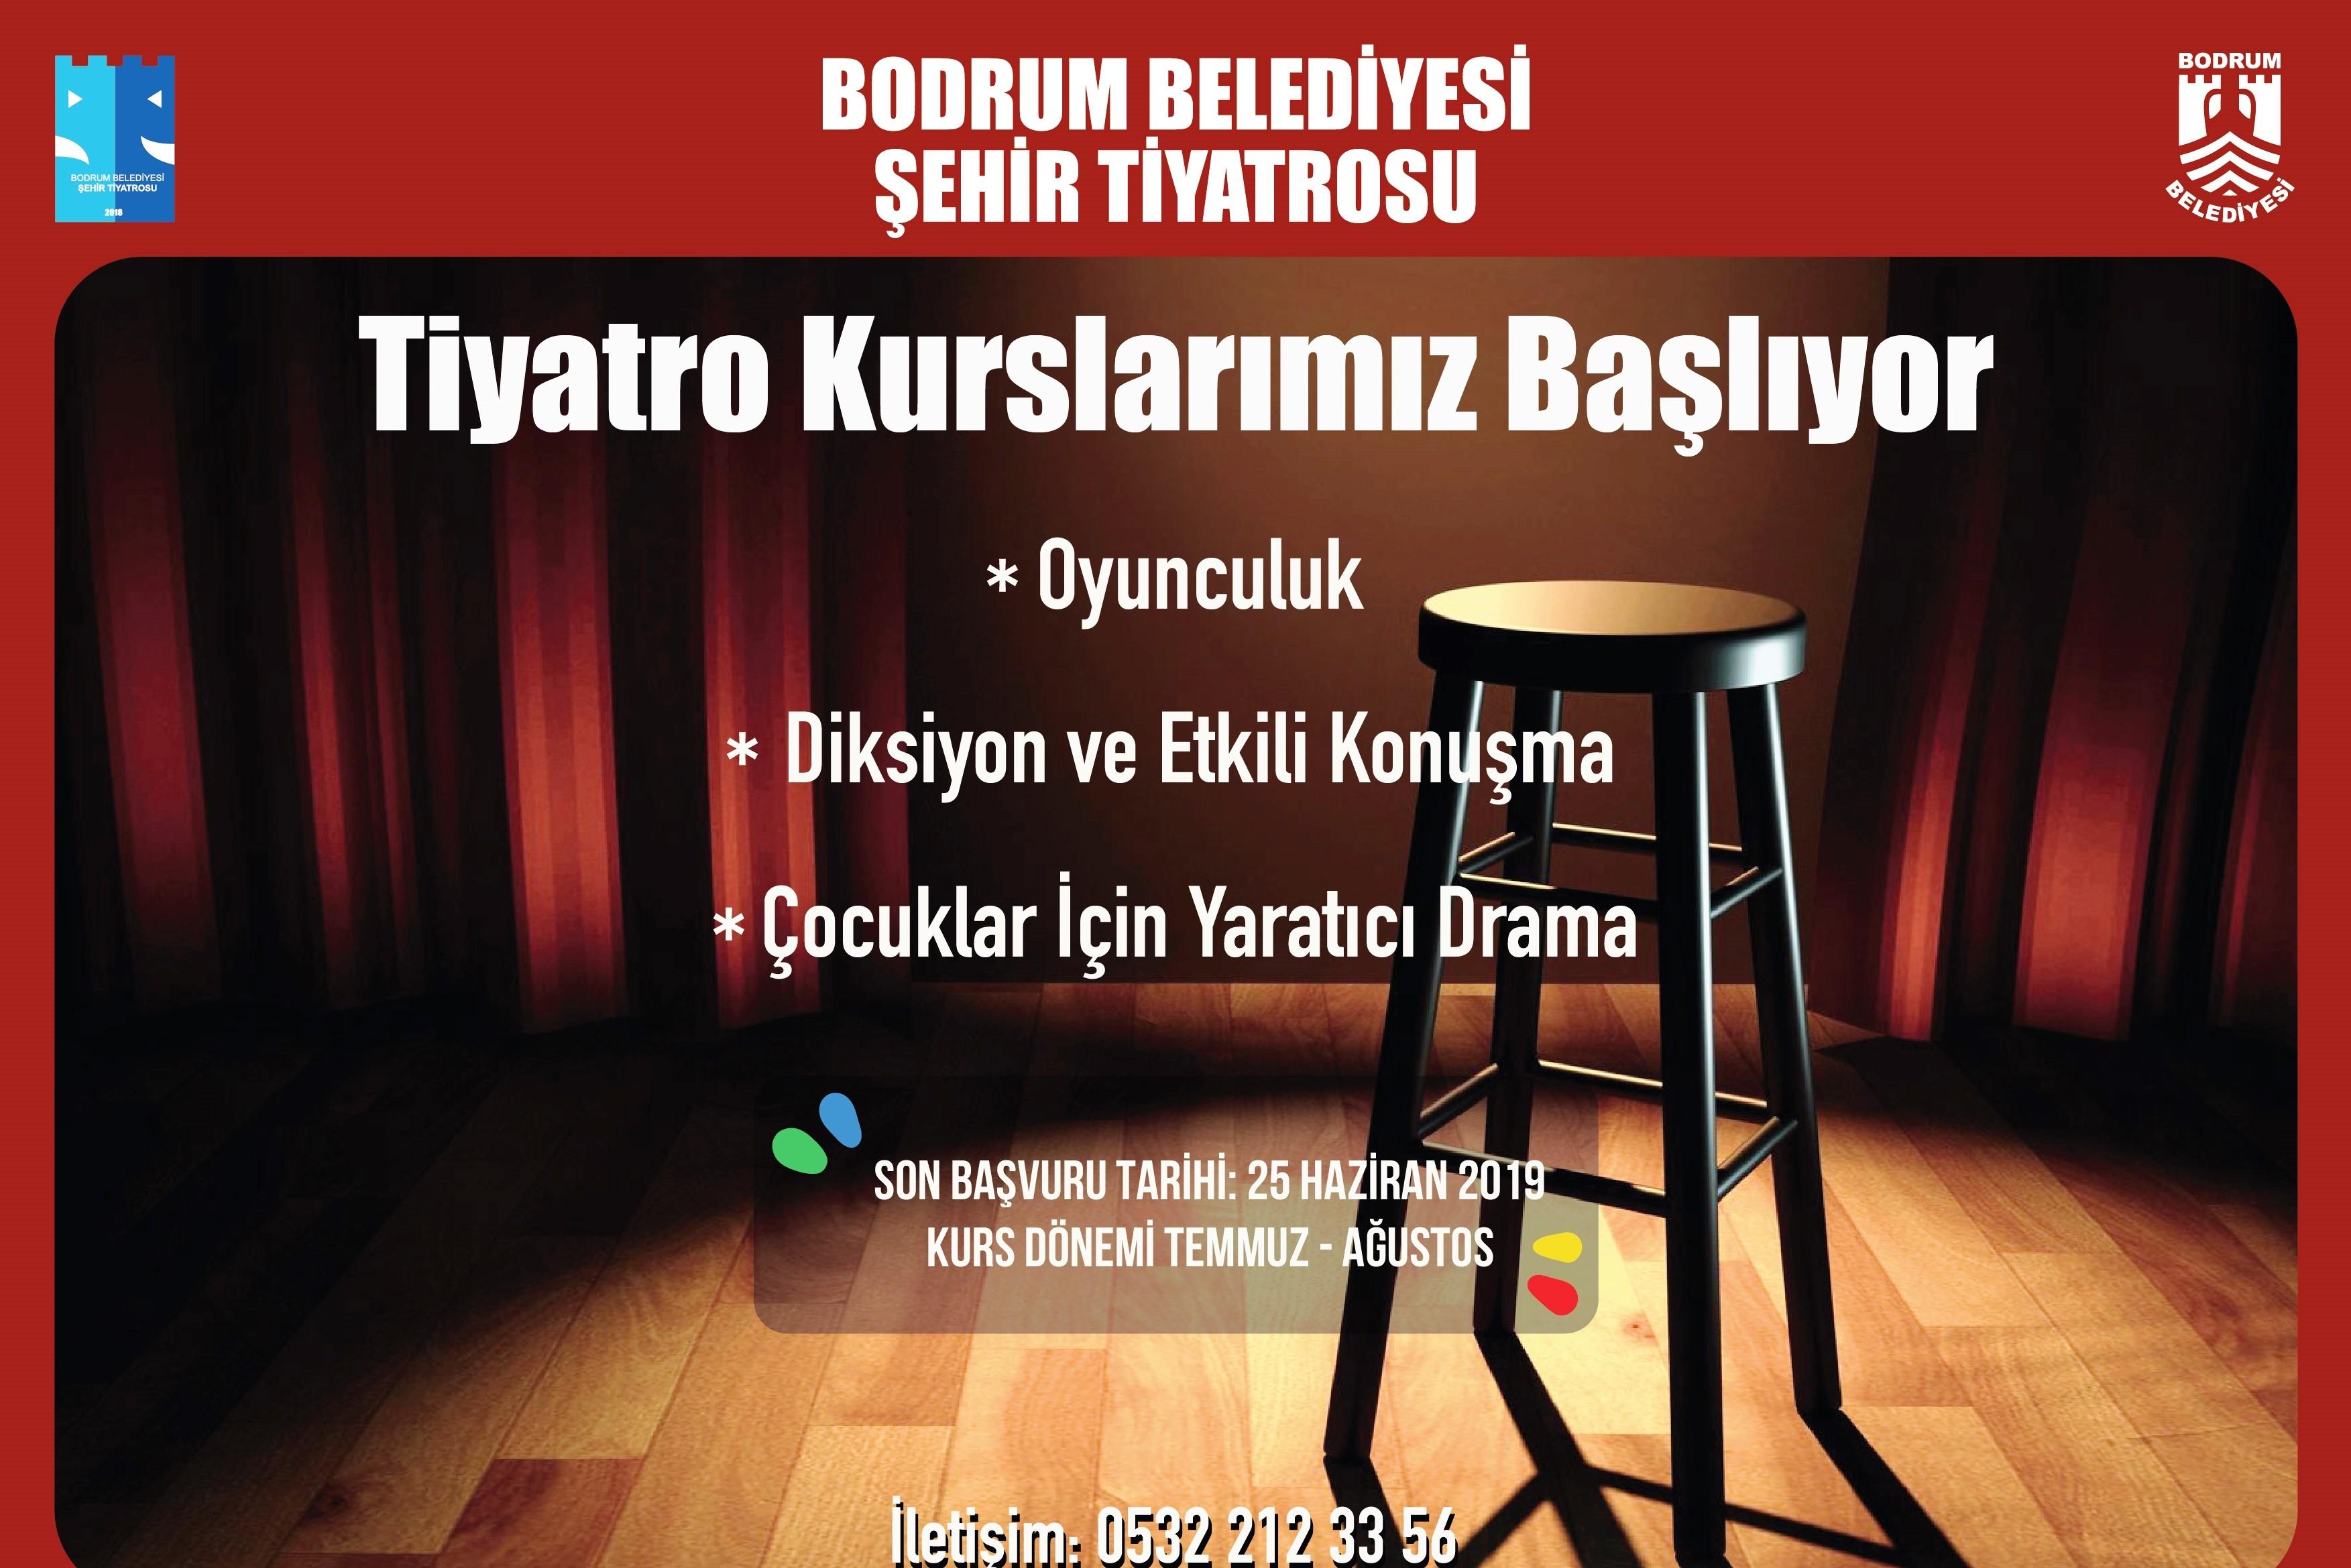 bodrum şehir tiyatrosu BODRUM ŞEHİR TİYATROSU KURSLARI BAŞLIYOR… bodrum sehir tiyatrosu kurslari